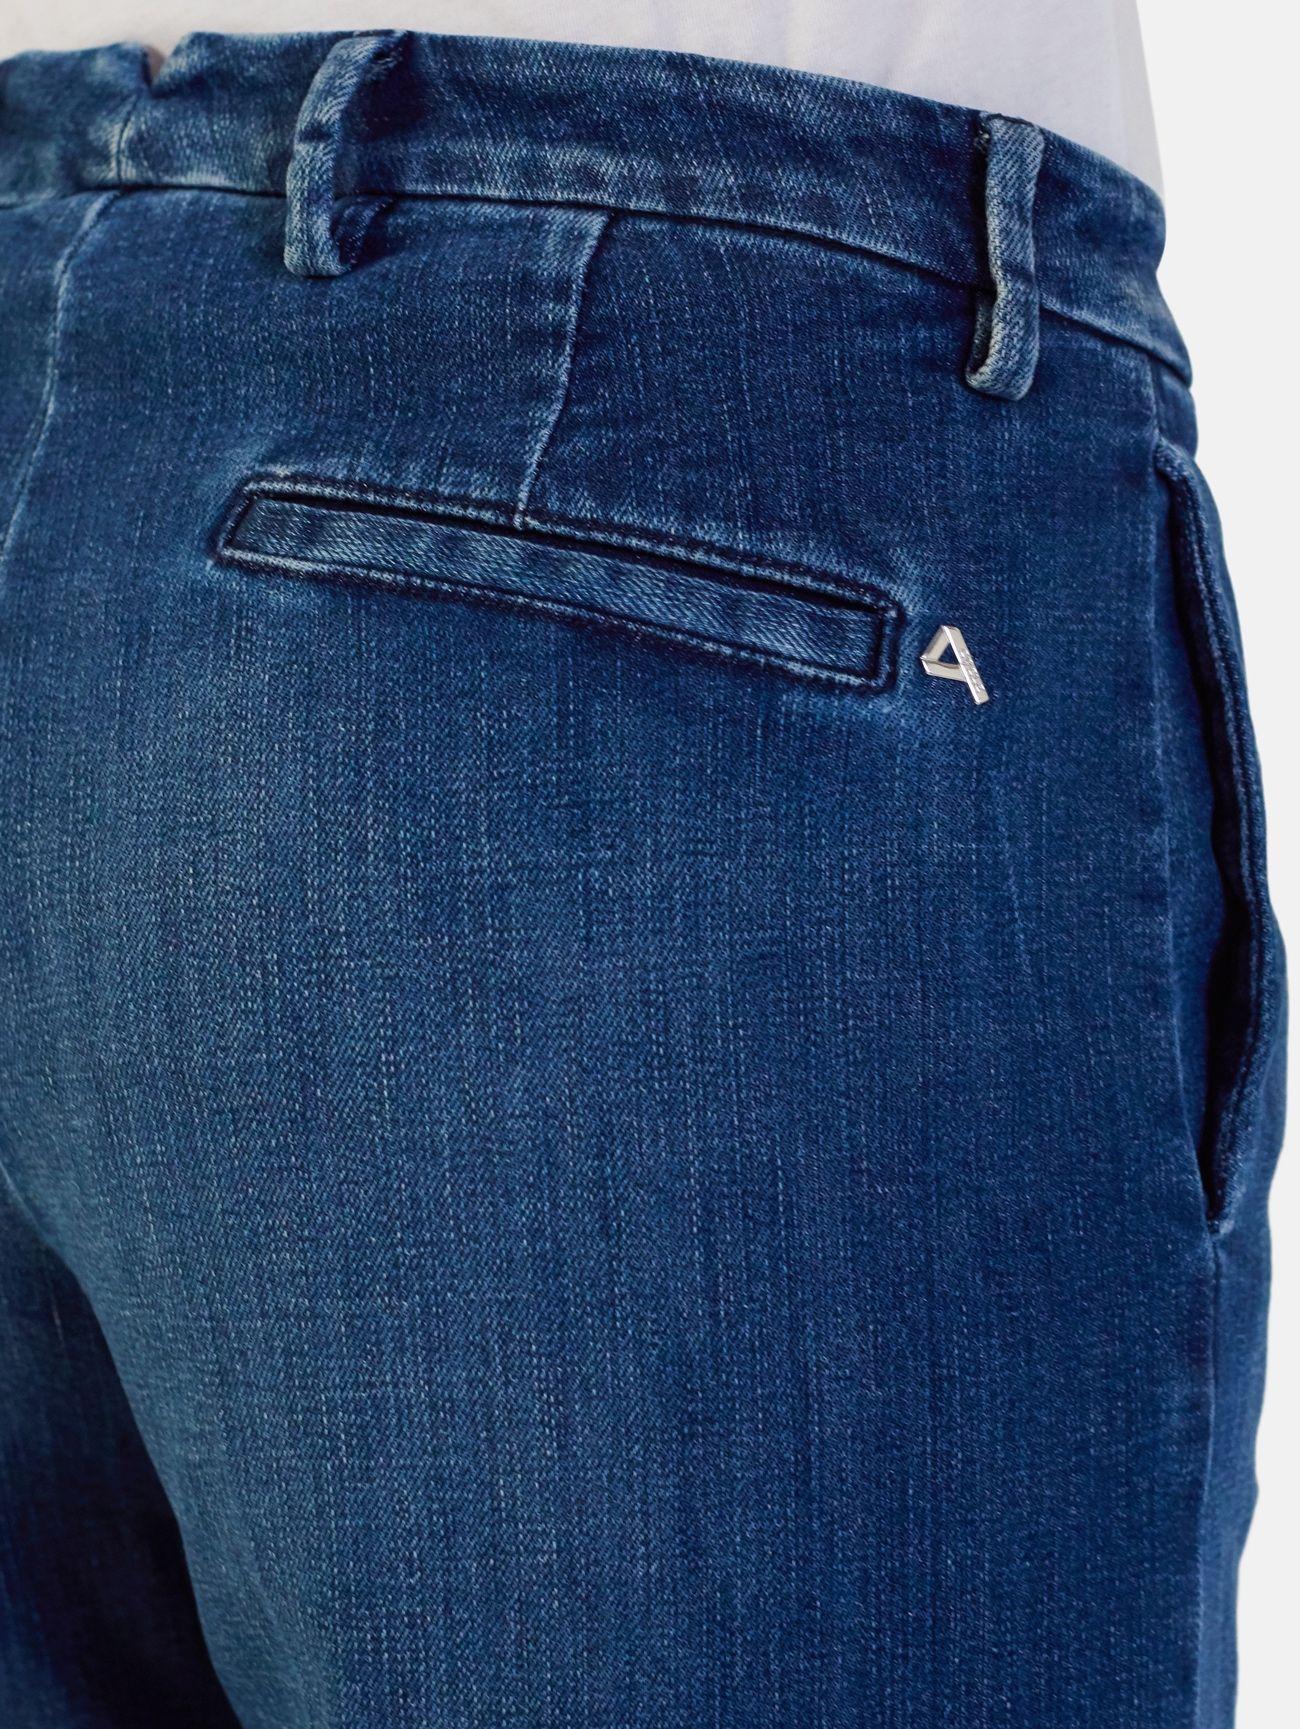 CHARLA CHINO REGULAR WAIST PENCE WIDE LEG LASER&OZONE FINISH BLUE